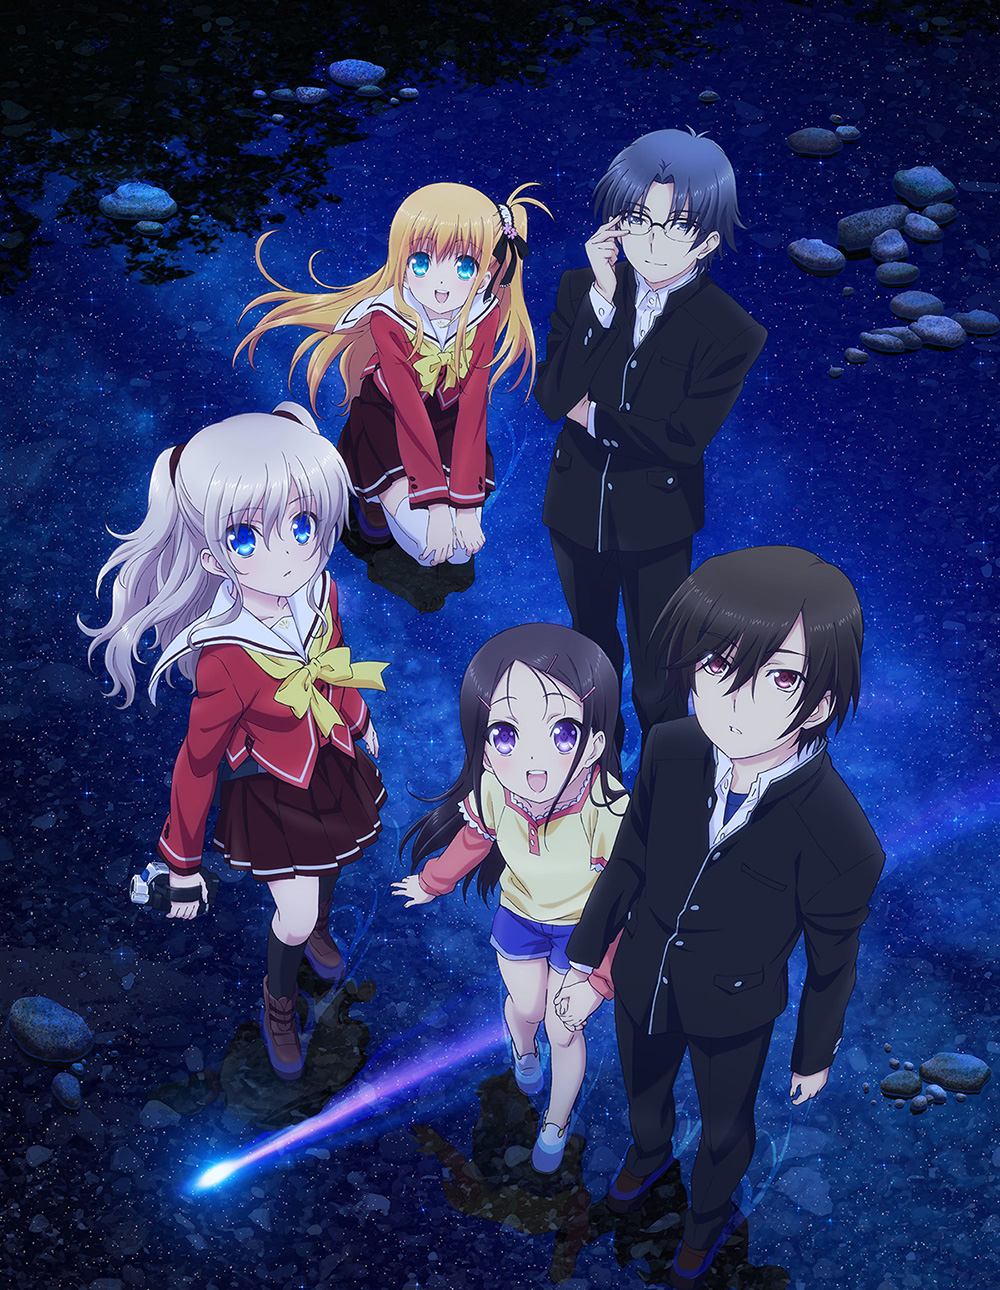 Charlotte-Anime-Visual-4